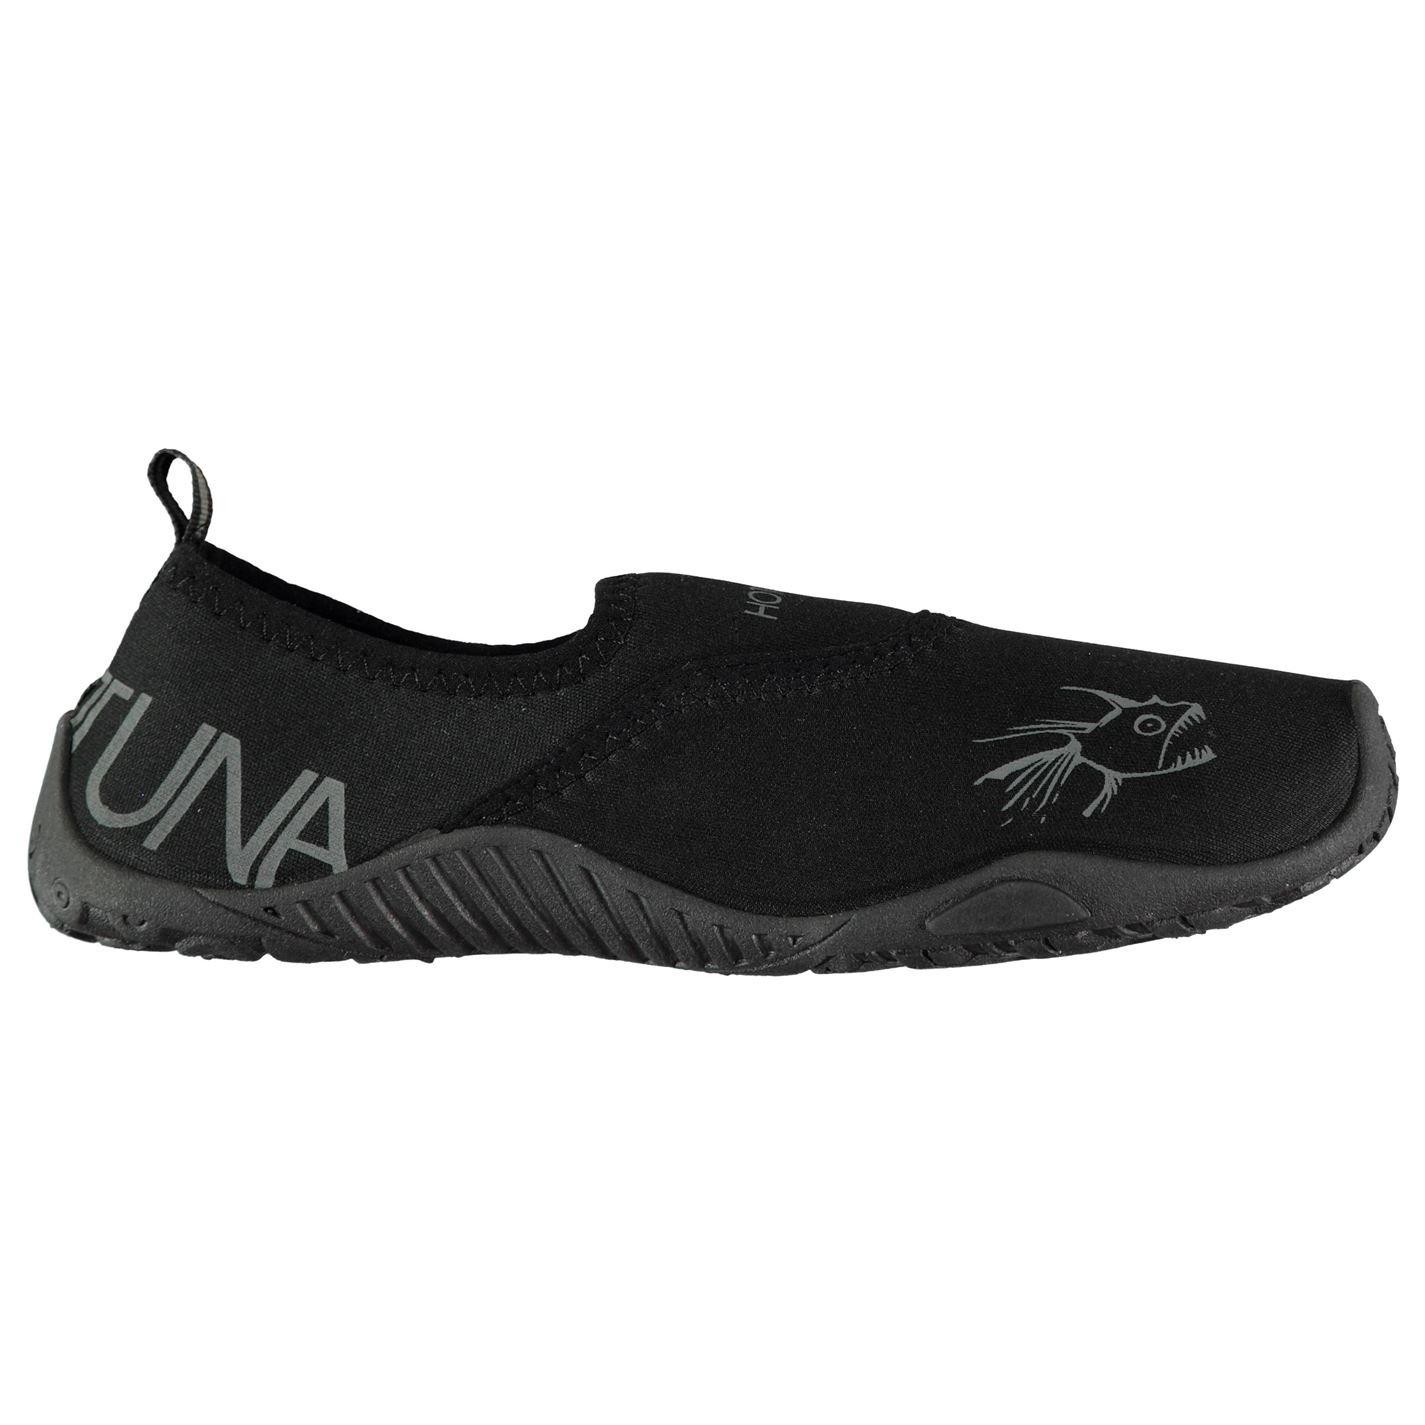 Hot Tuna Splasher Aqua Shoes- Buy